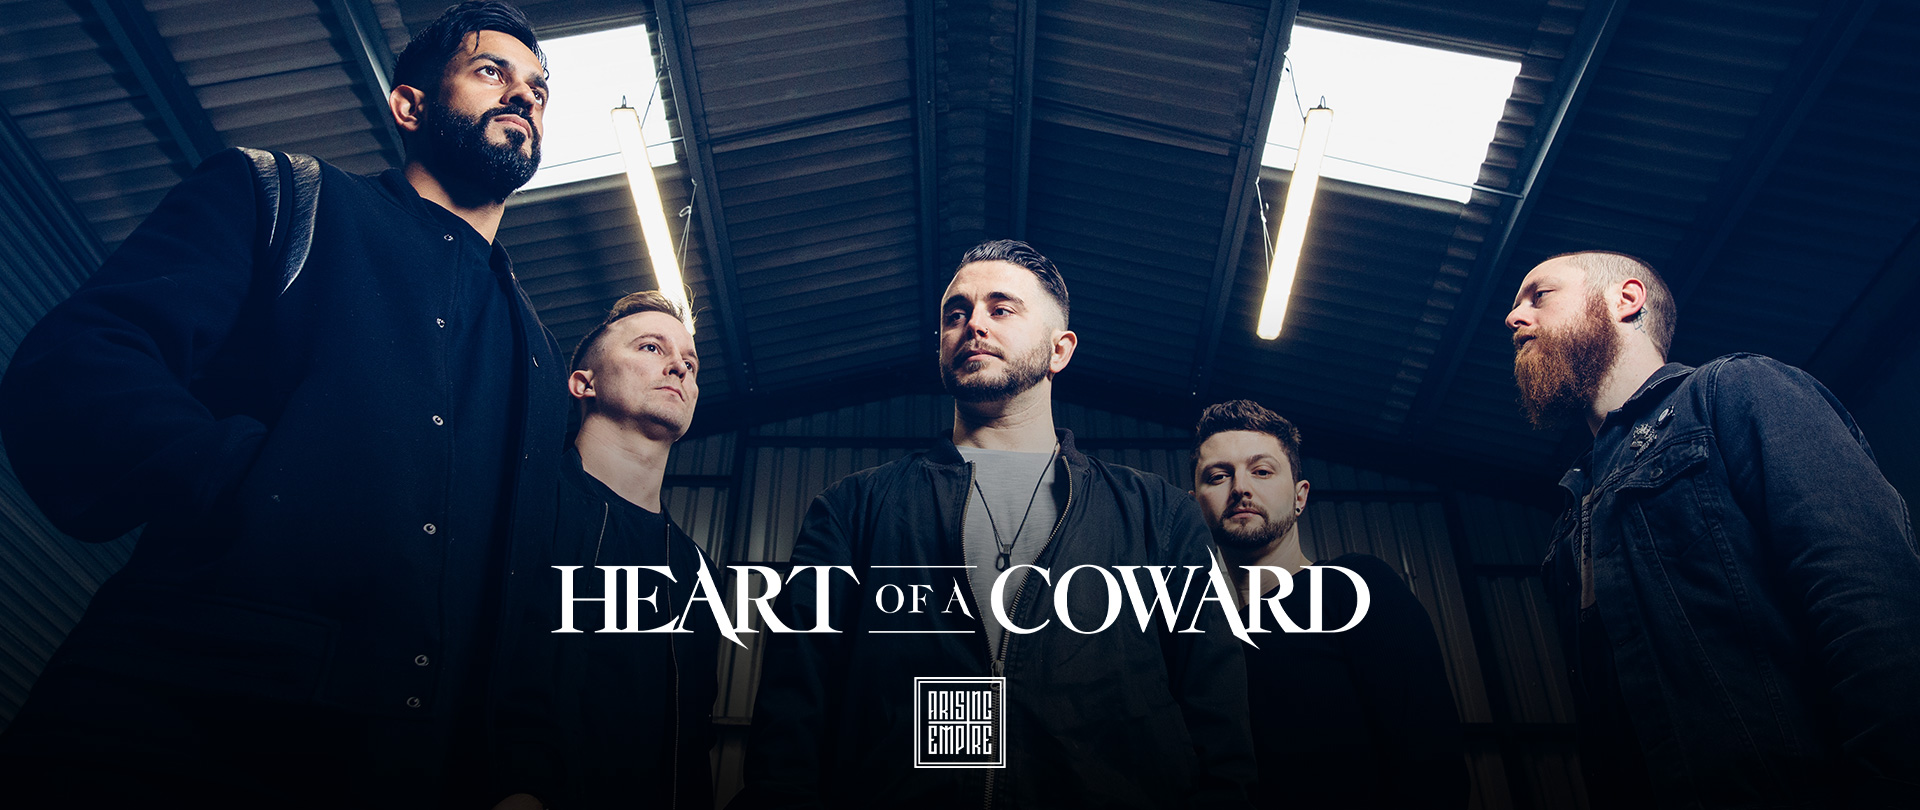 Heart Of A Coward at Arising Empire • Official Online Shop / EN